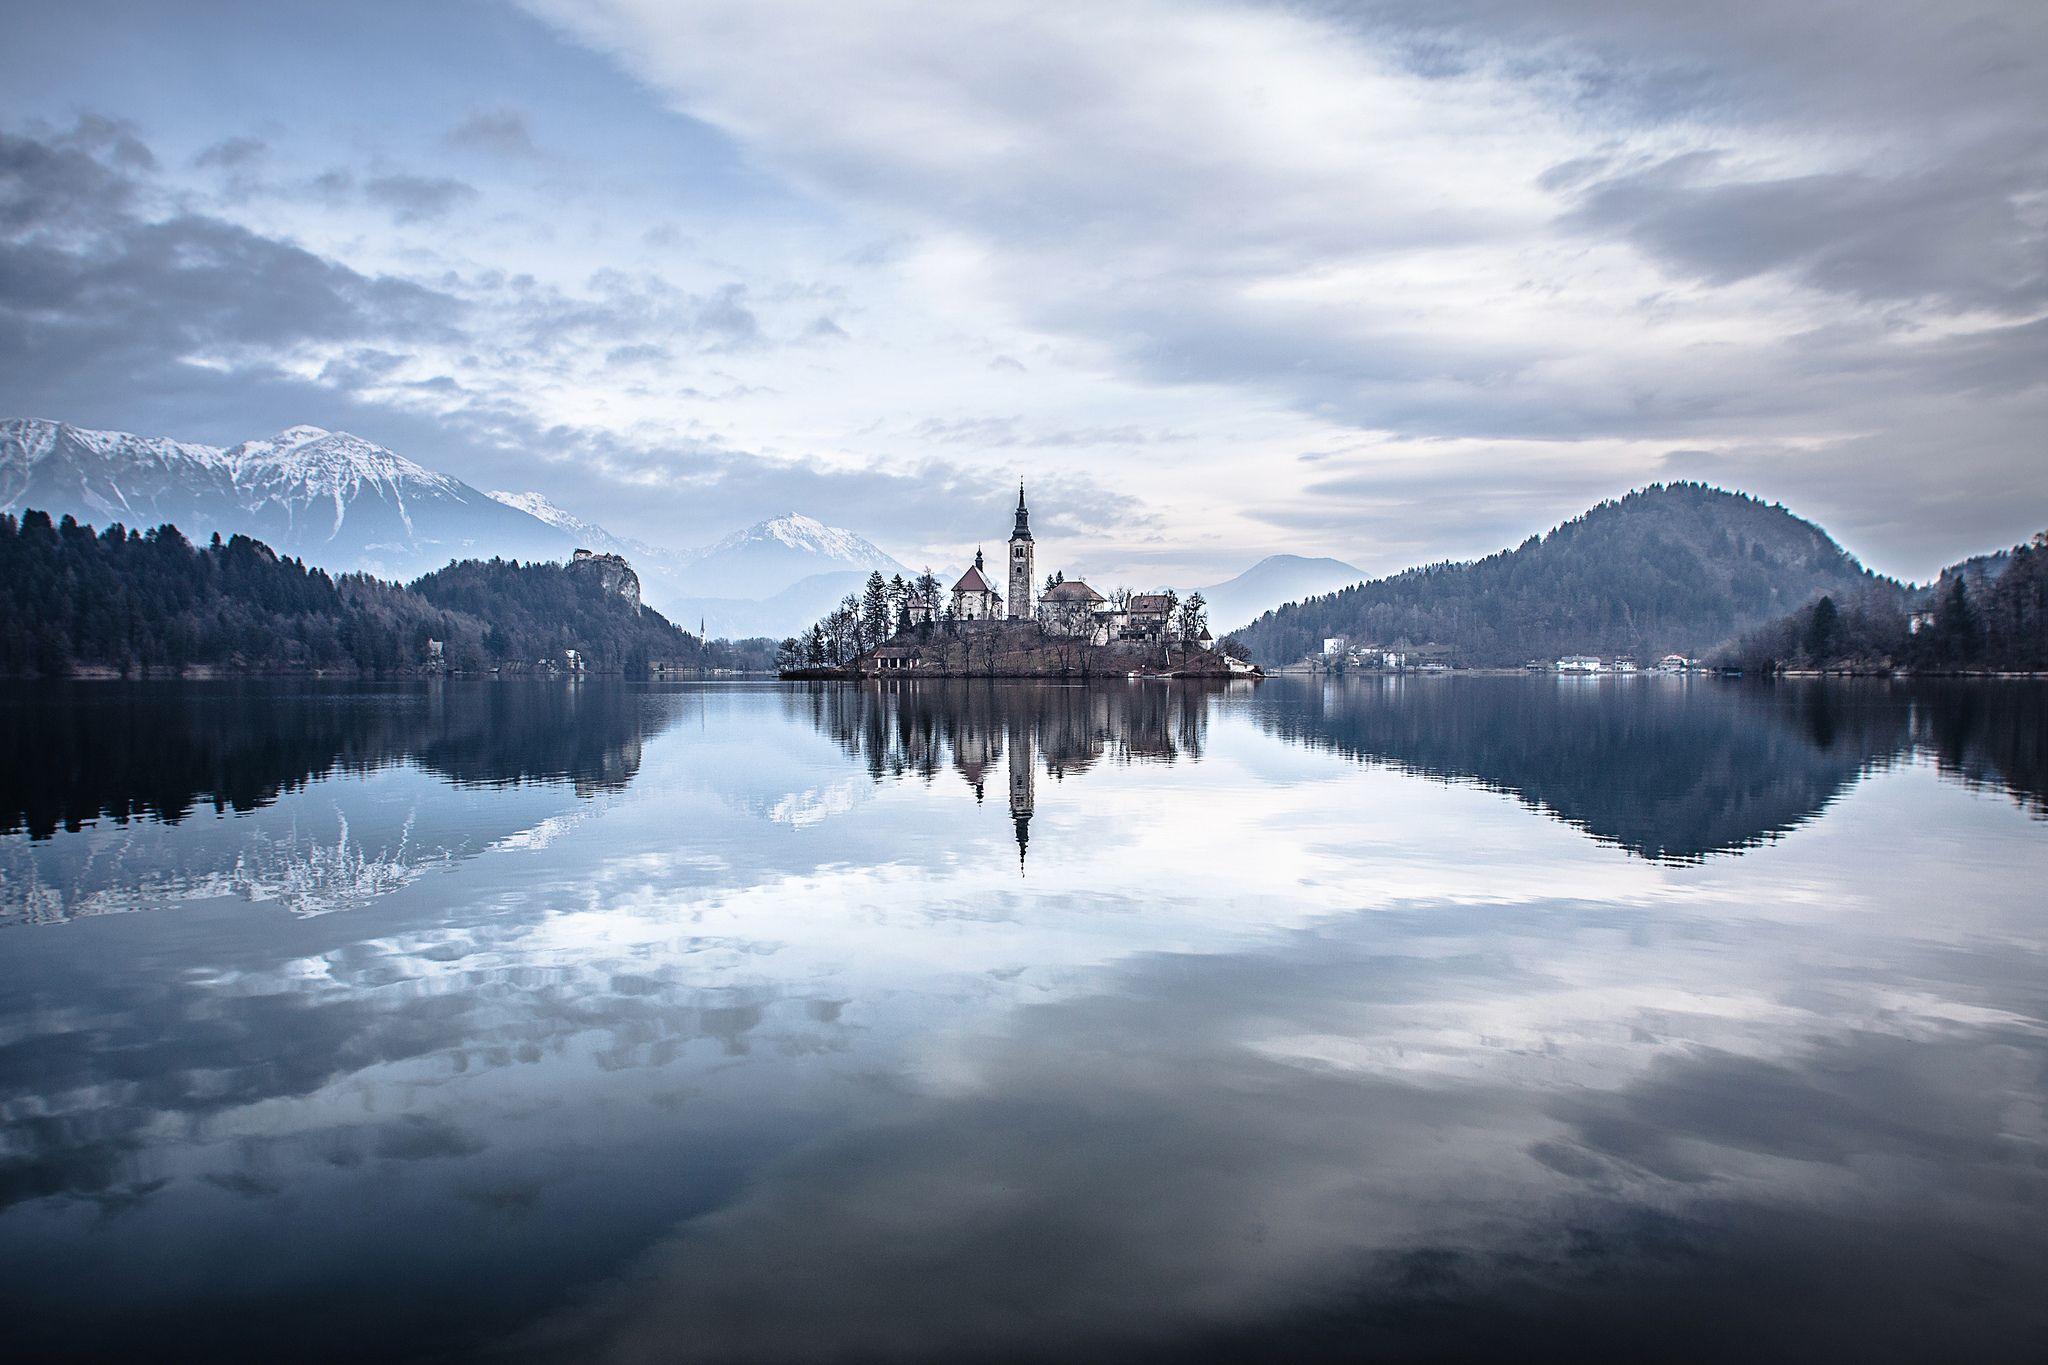 https://flic.kr/p/h7QTmT | Lake Bled, Slovenia